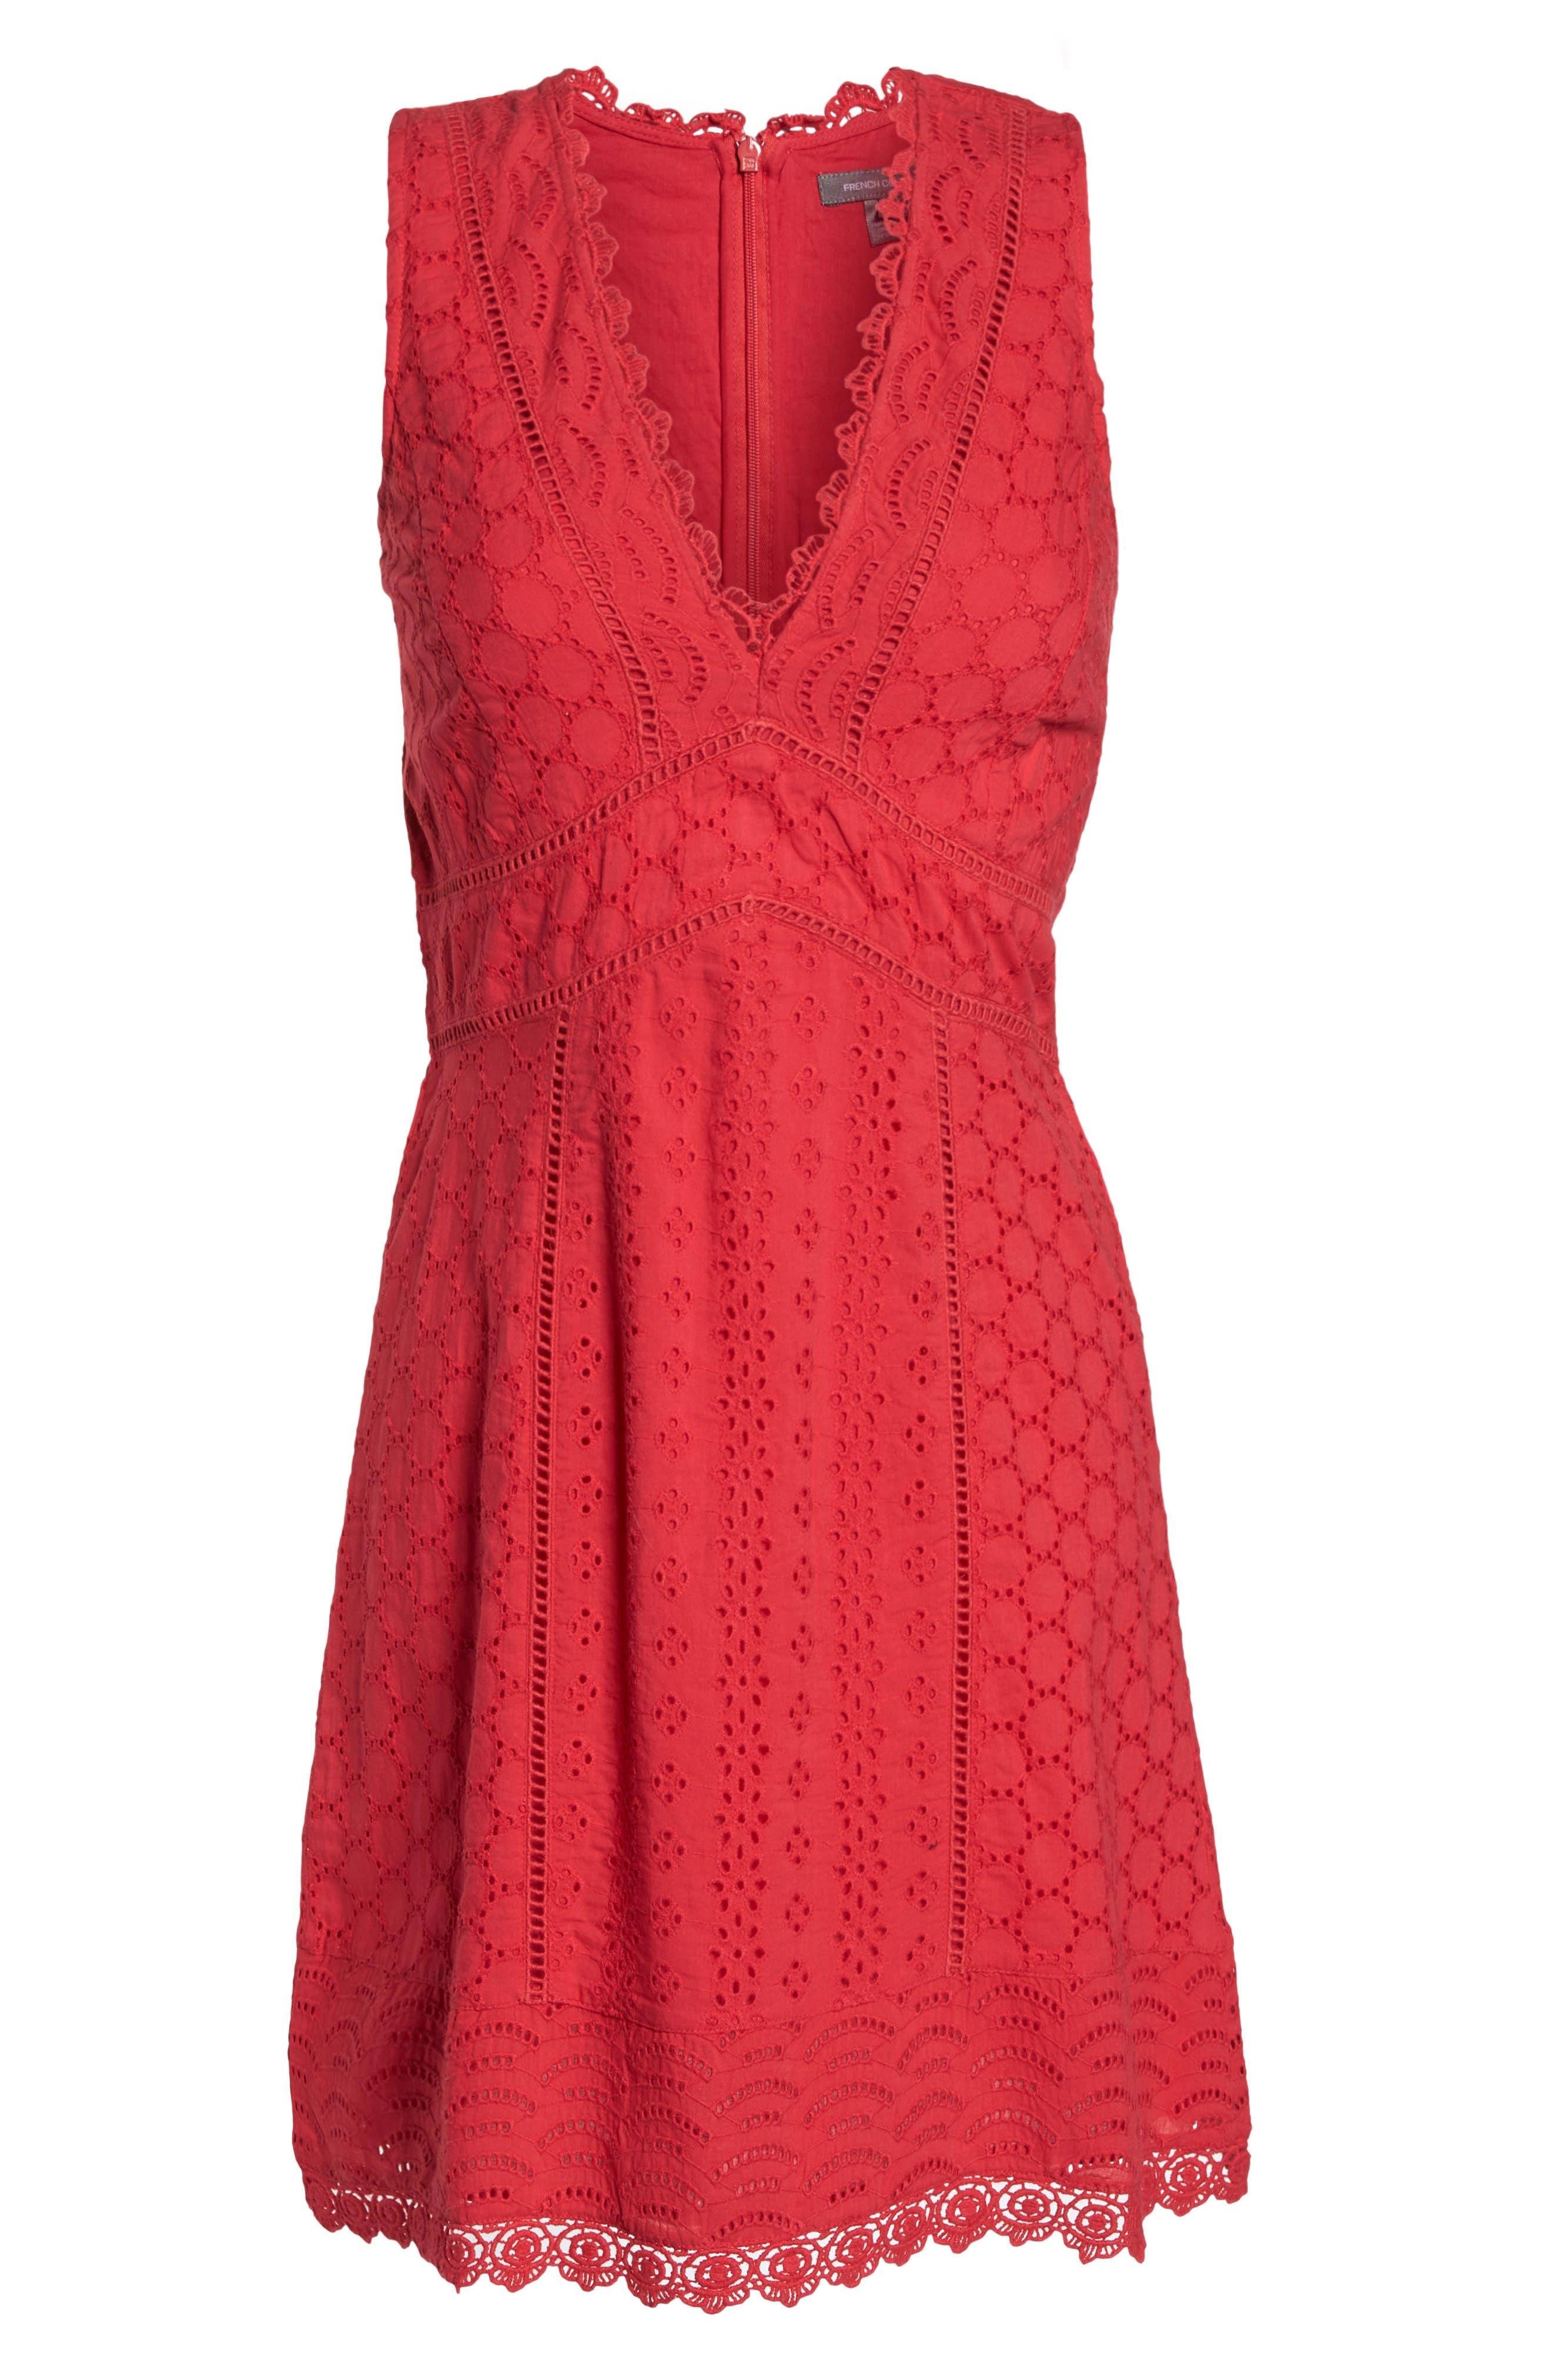 Zahara Eyelet & Lace A-Line Dress,                             Alternate thumbnail 7, color,                             WATERMELON